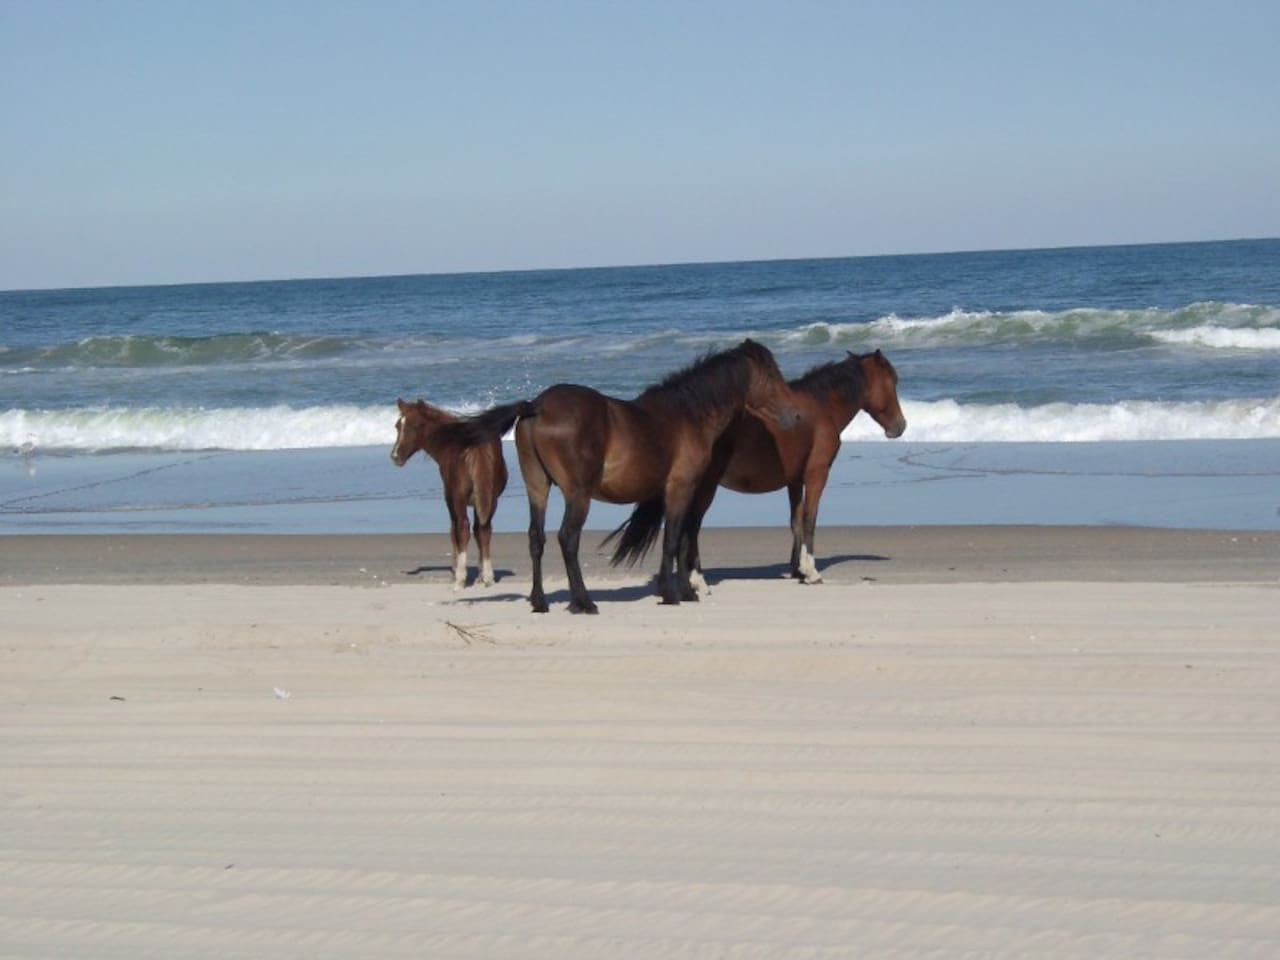 Wild horses on the beach.